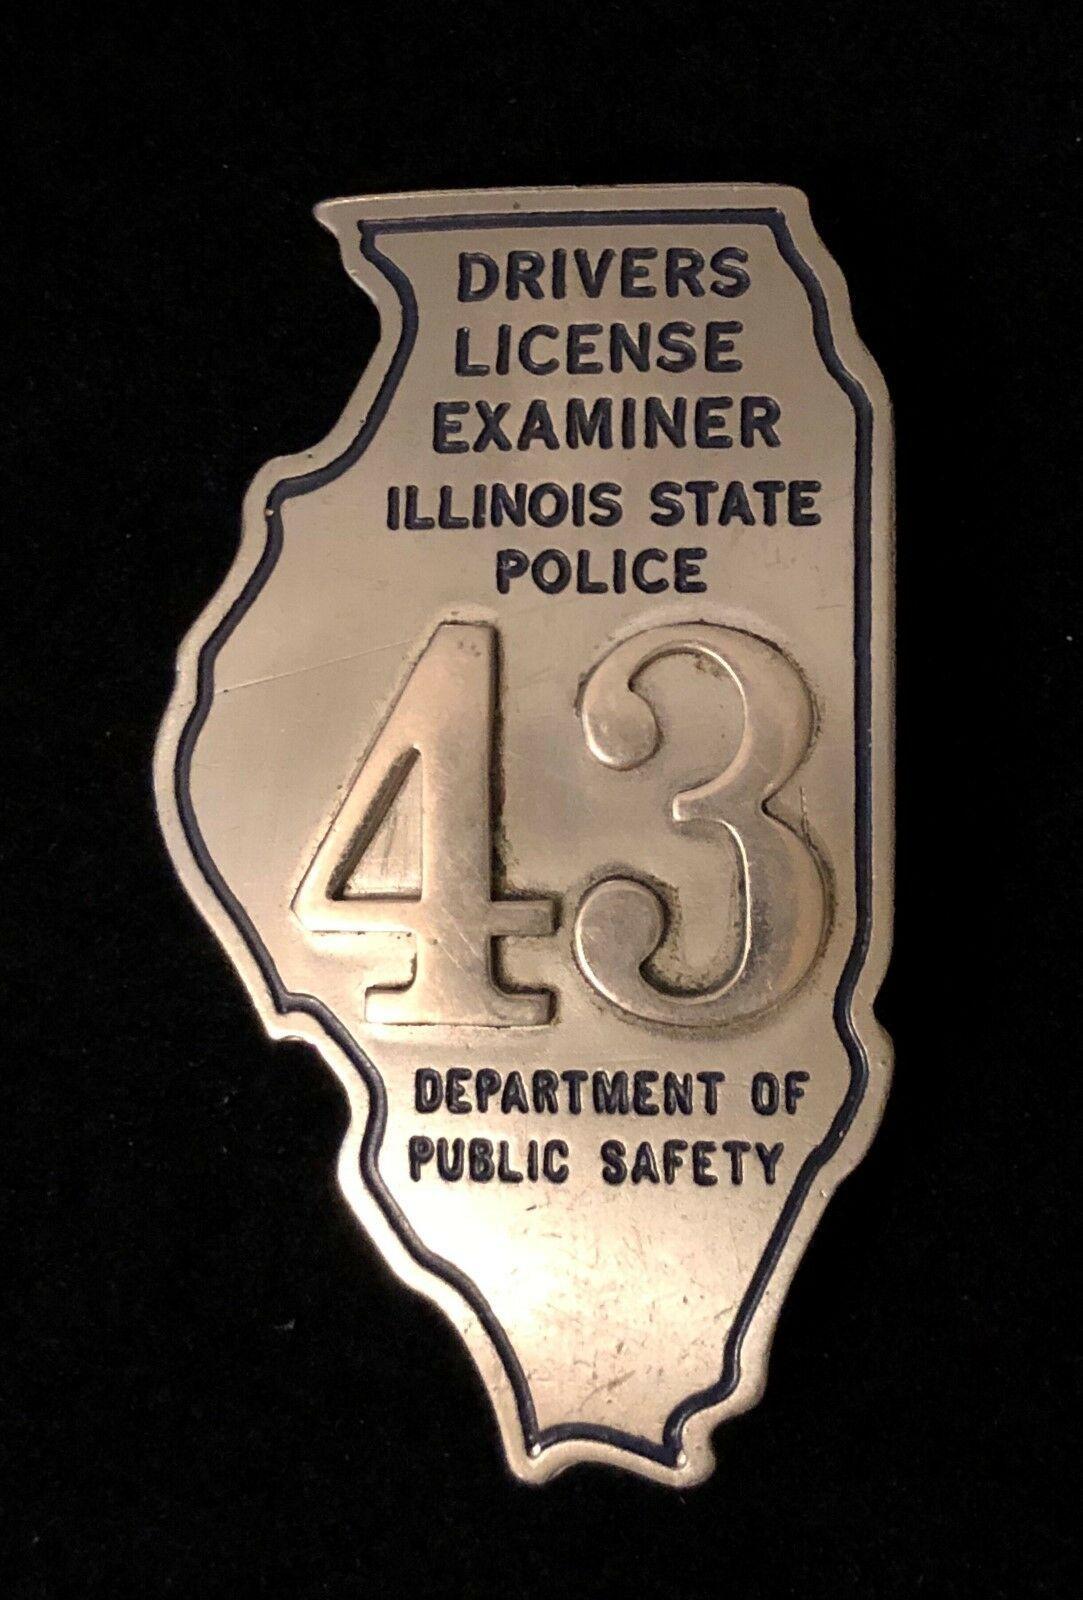 Driver License Examiner, Illinois States Police